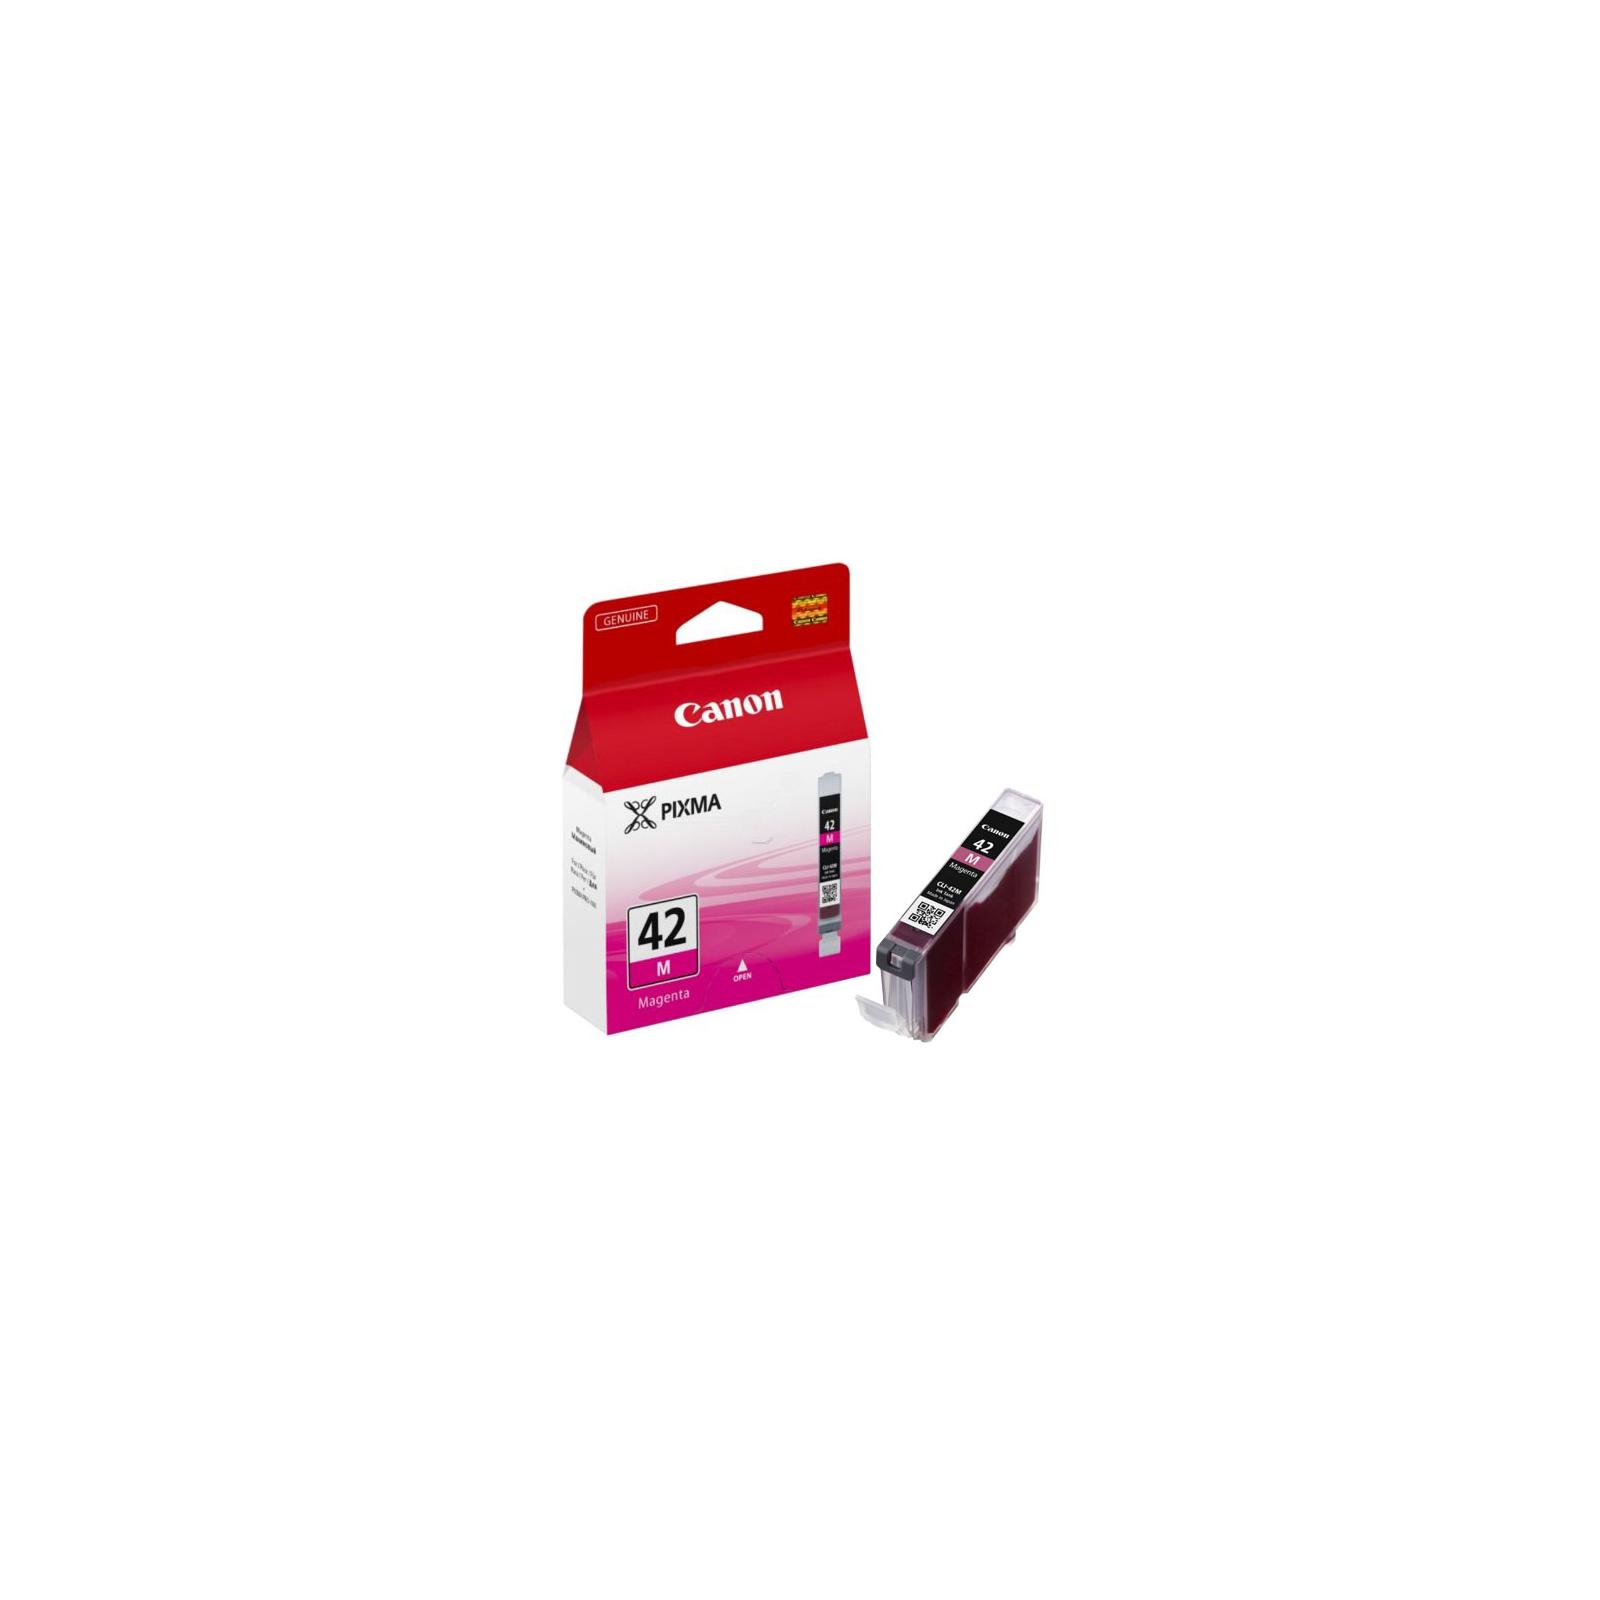 Картридж Canon CLI-42 Magenta для PIXMA PRO-100 (6386B001)